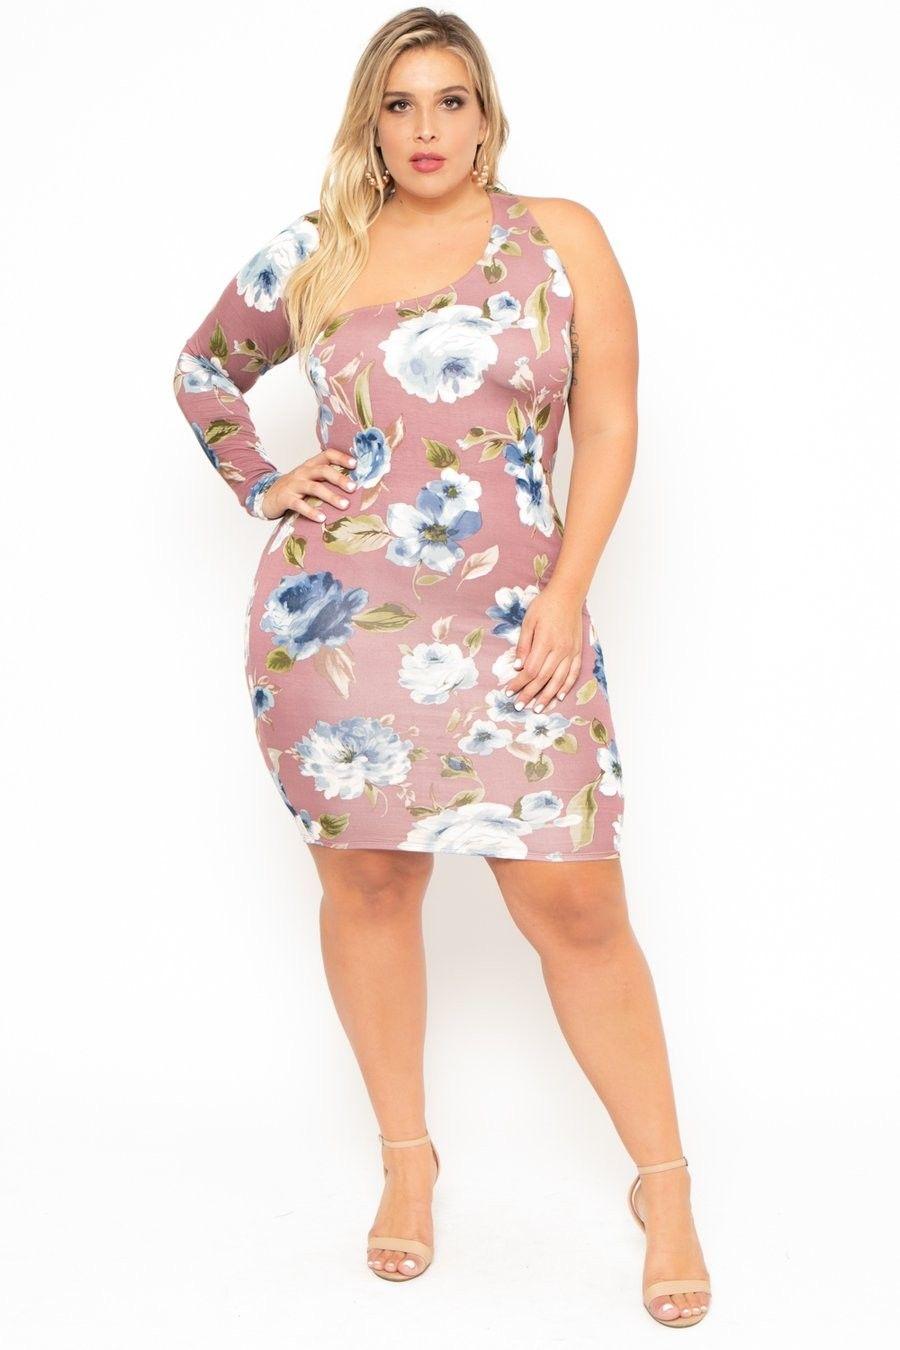 35f7e872b Plus Size Floral One Sleeve Asymmetric Dress- Mauve  29.00  fashion  ootd   outfit  oufits  moda  plussize  dress  dresses  plussizeclothing   plussizedress ...